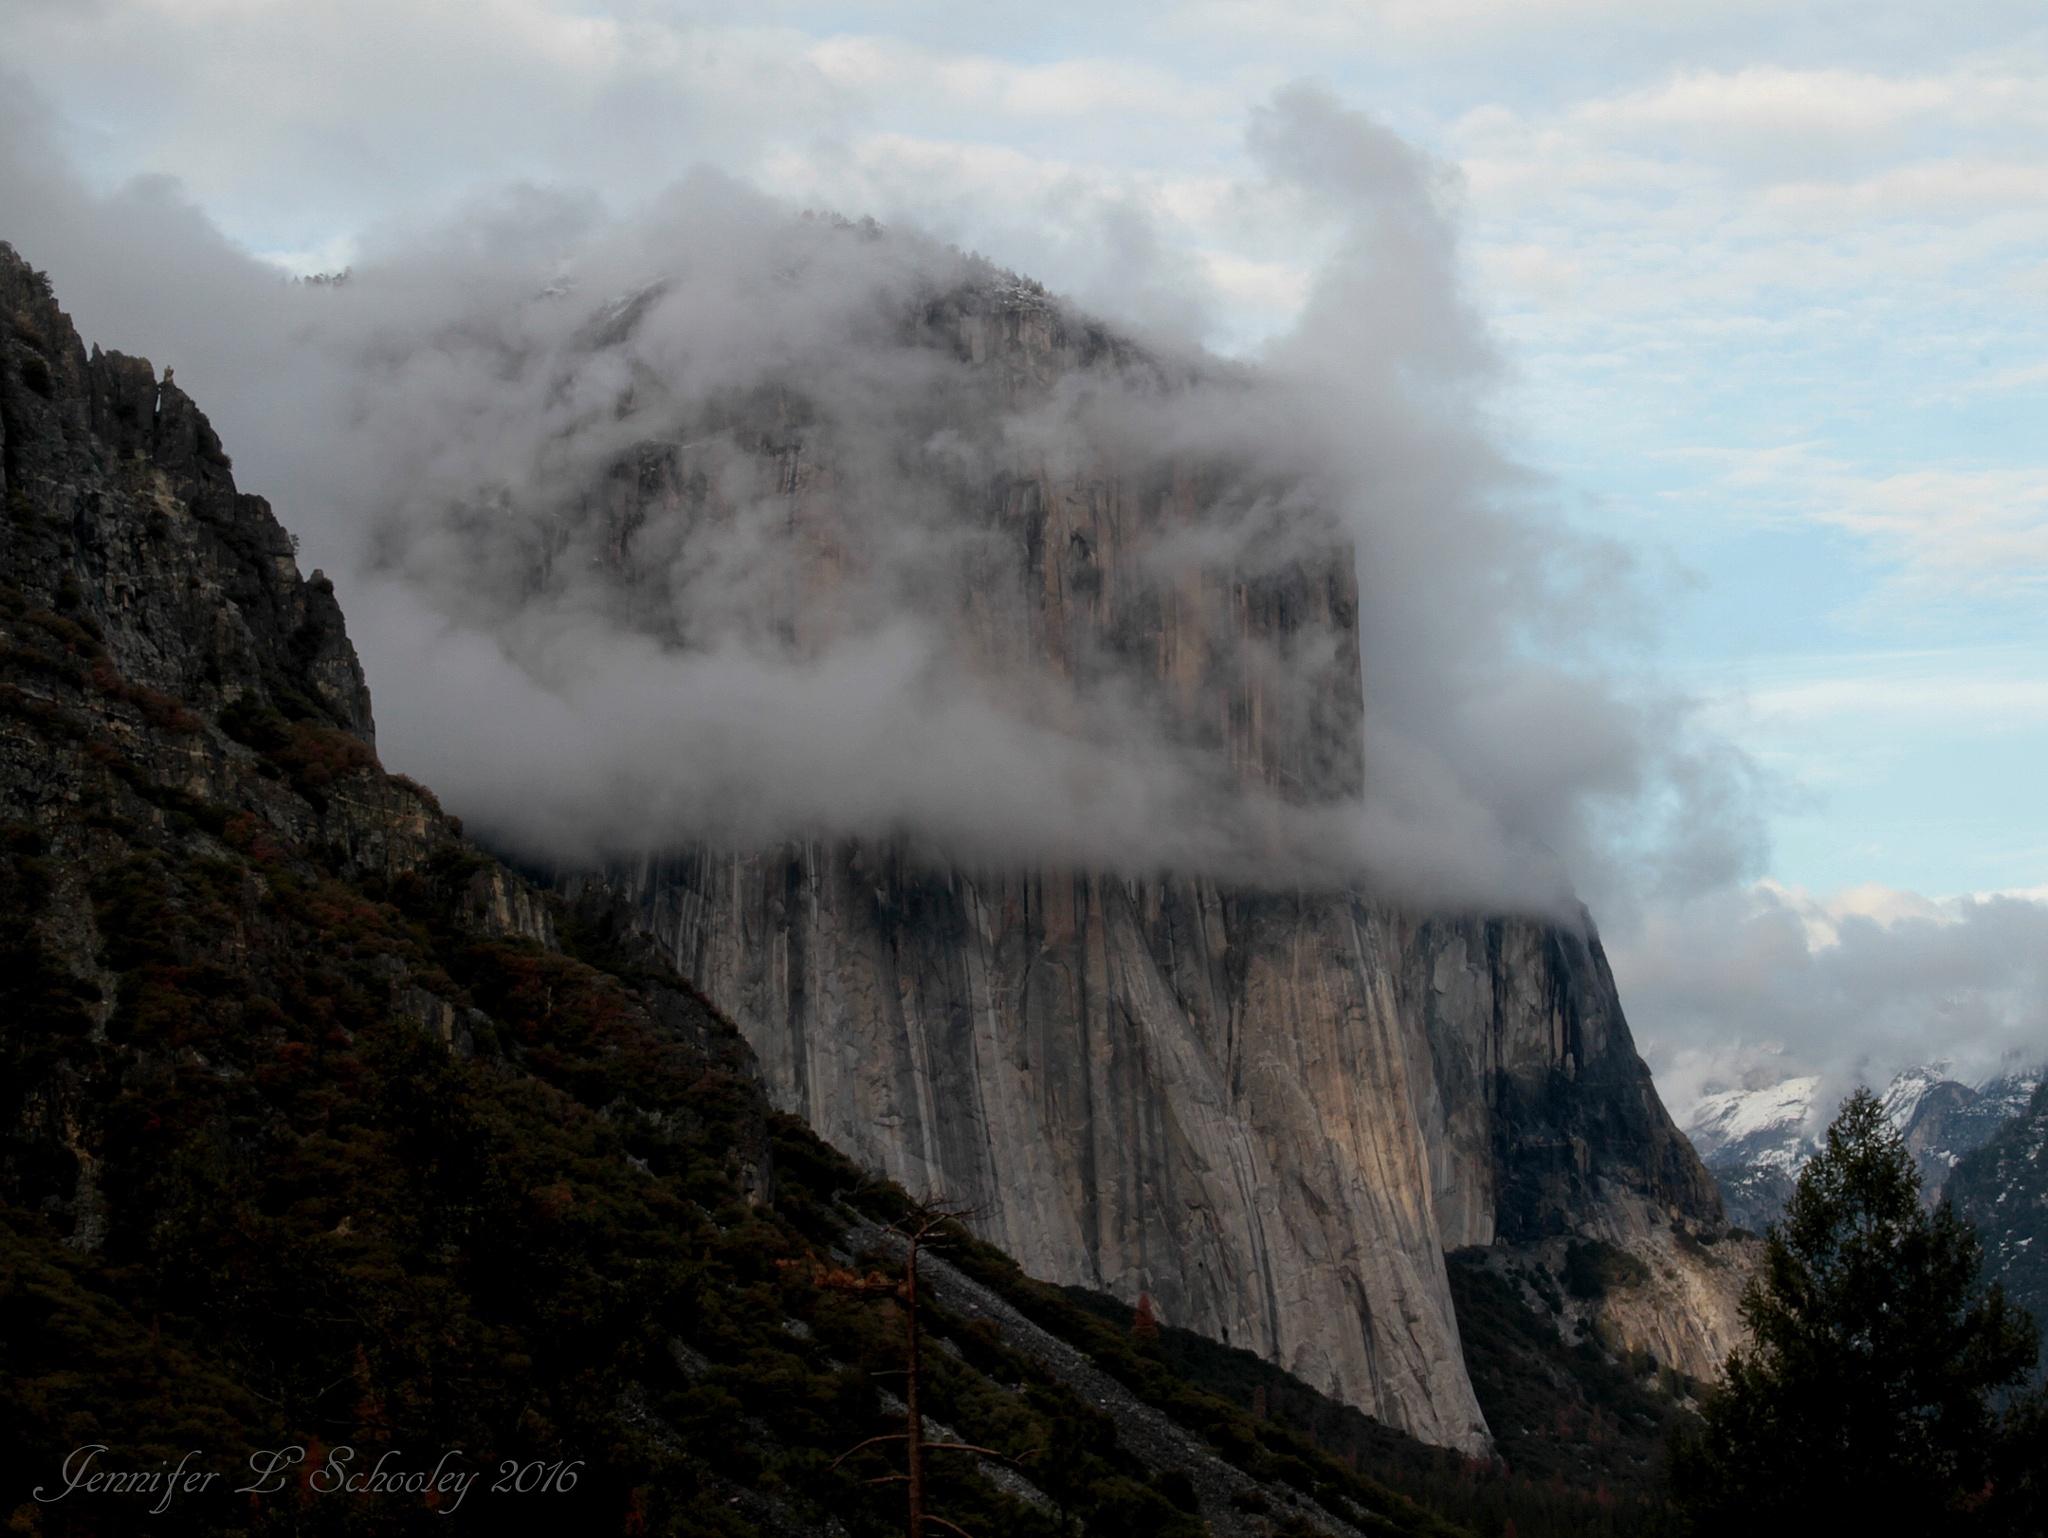 El Capitan - March 2016 - Incoming Storm by Jennifer Schooley